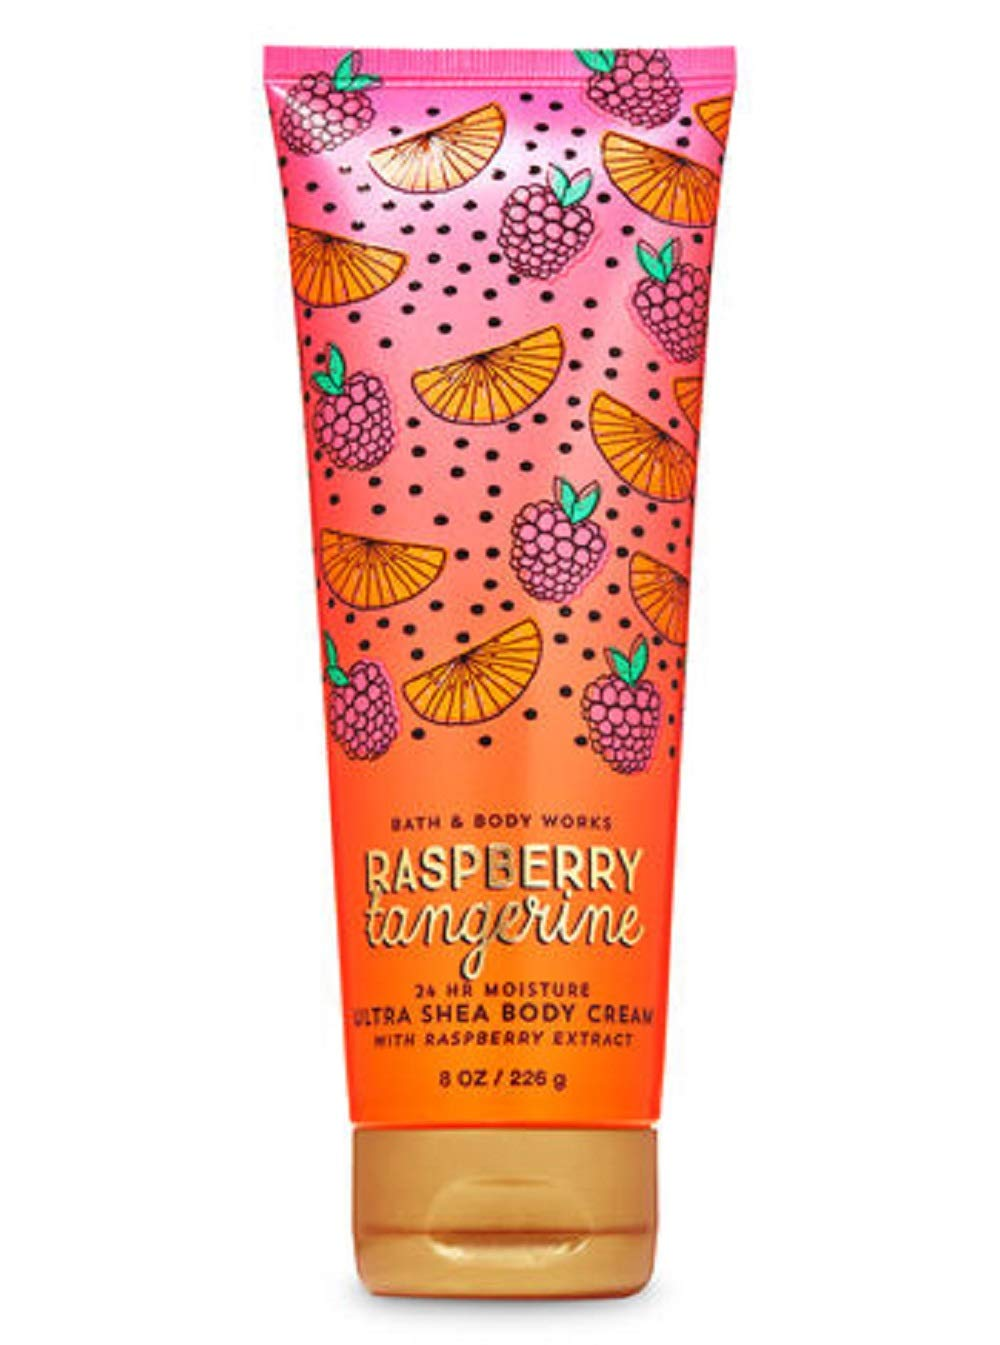 Bath and Body Works Raspberry Tangerine Body Cream 8 Ounce